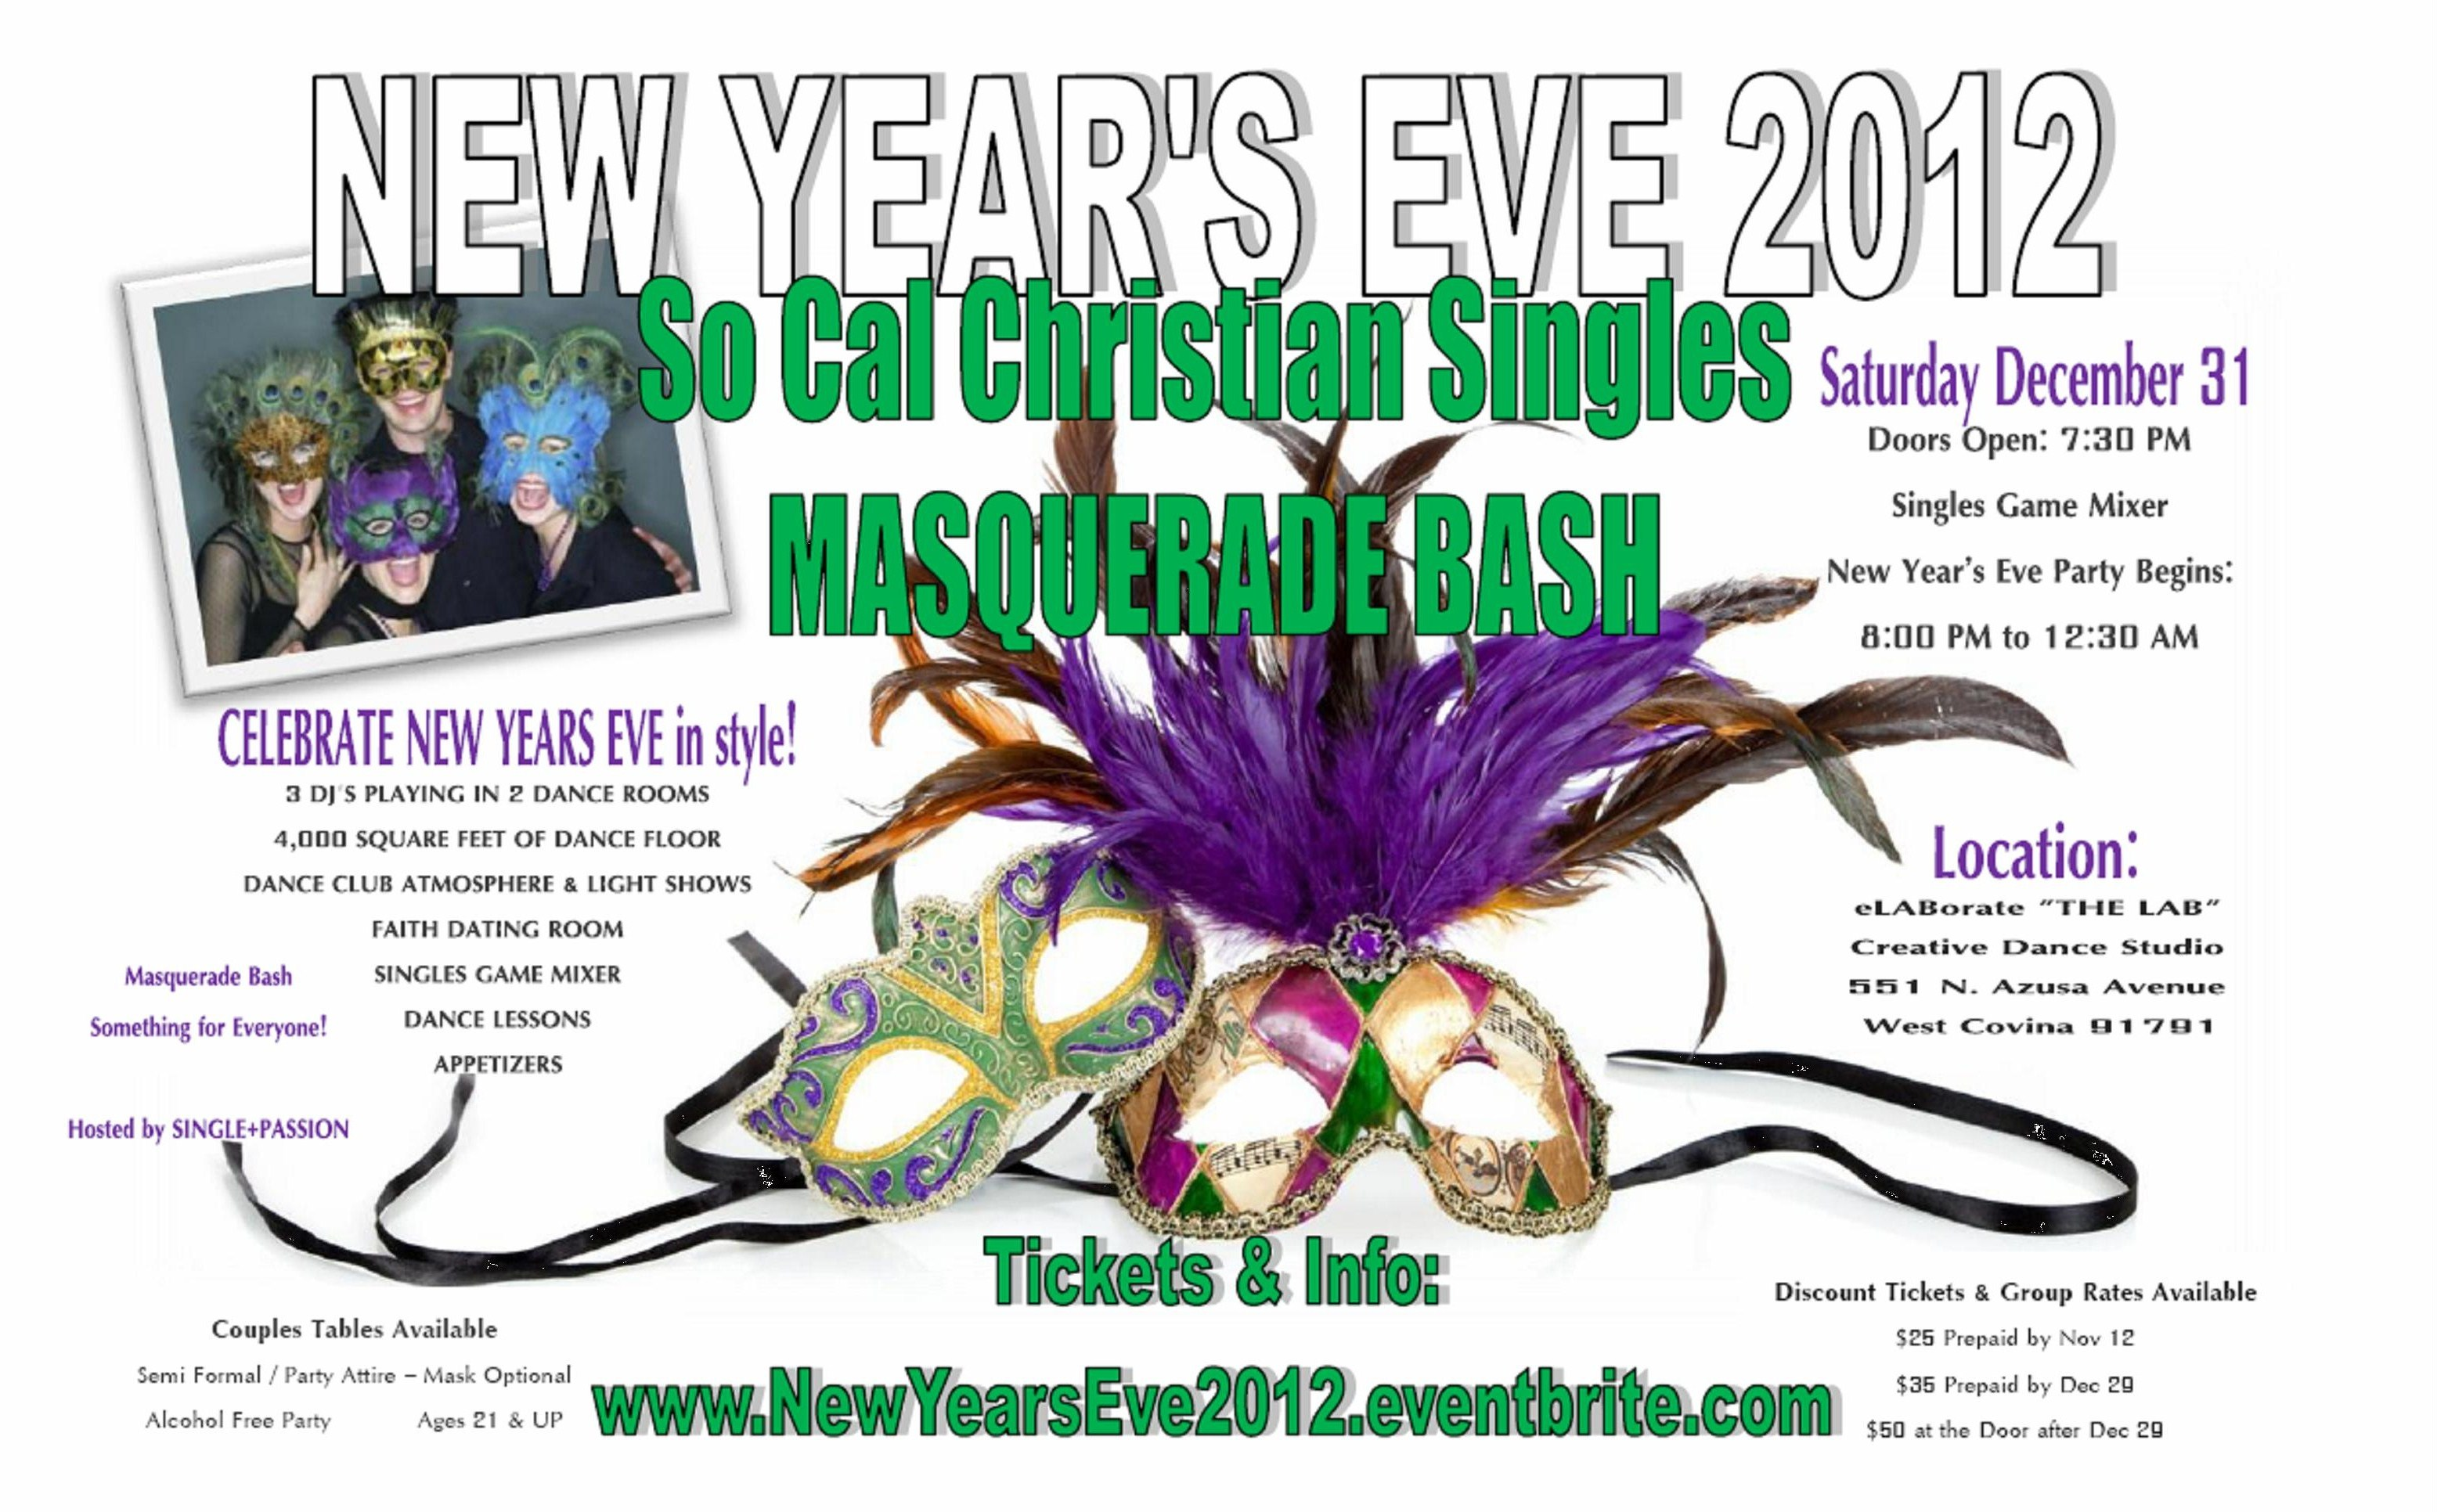 New Year's Eve Masquerade Bash